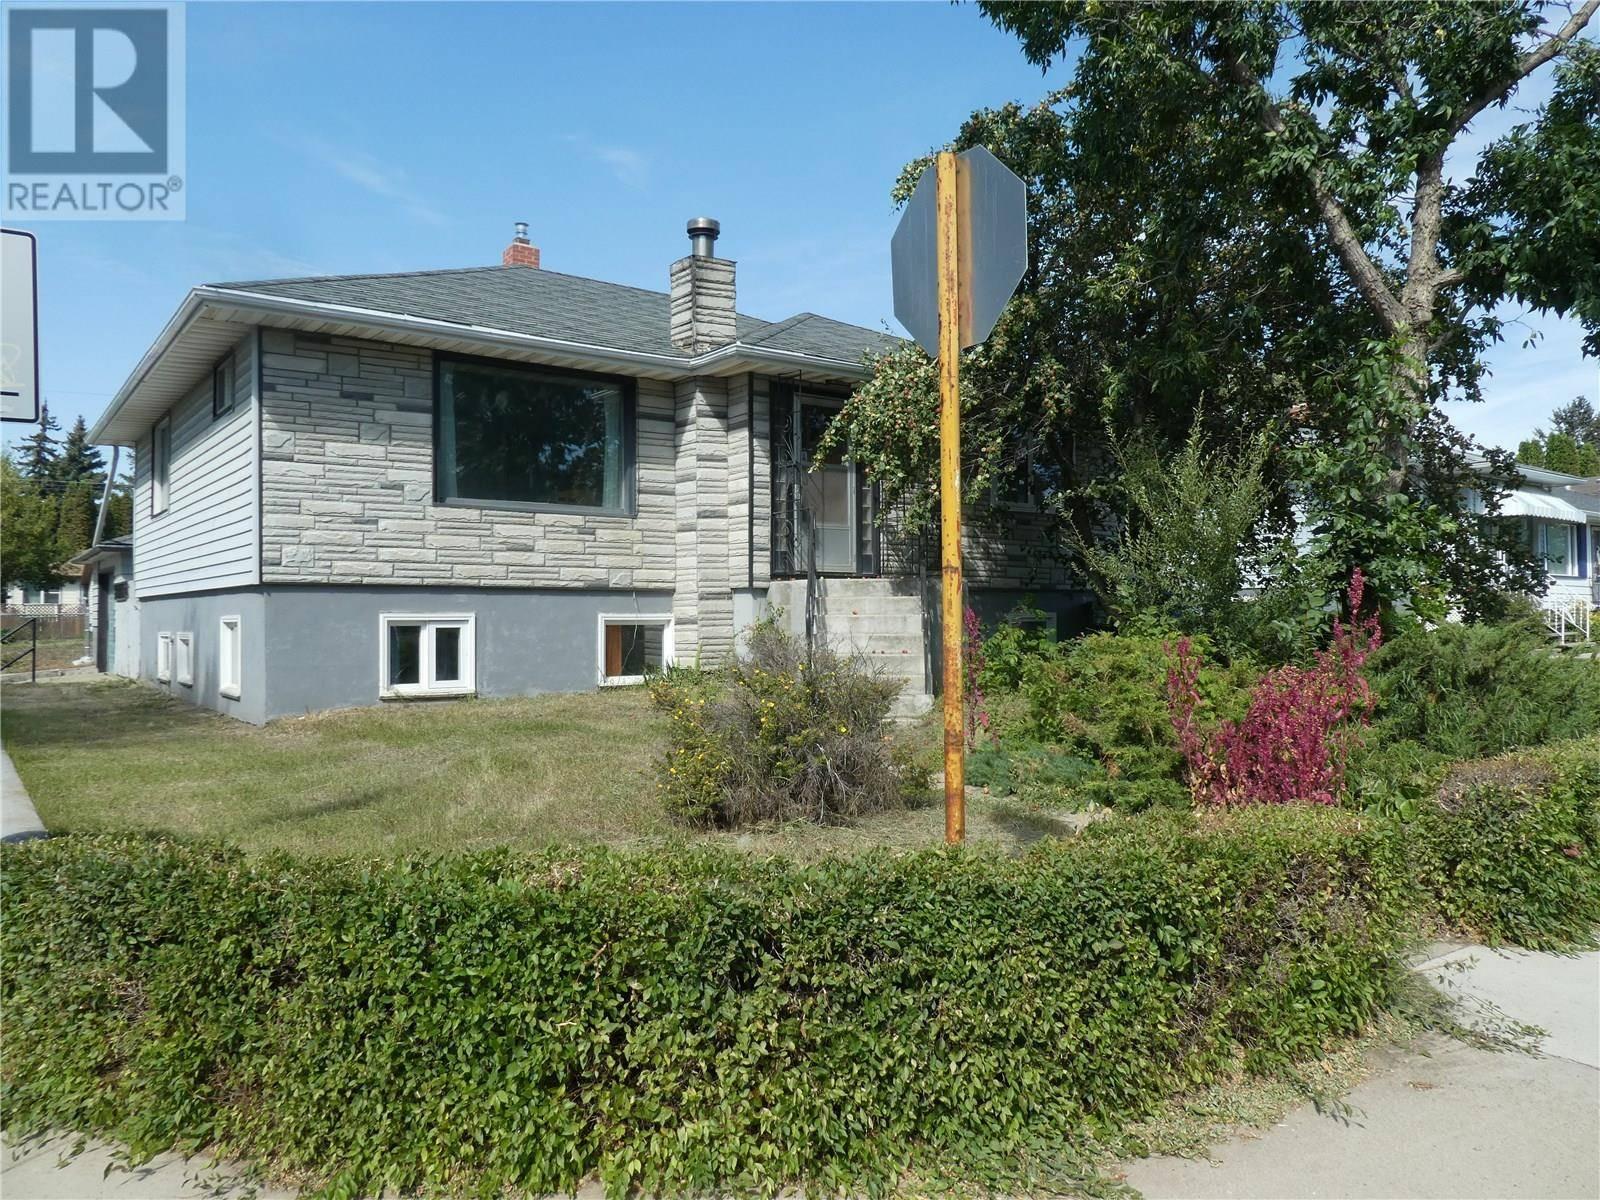 House for sale at 401 Q Ave N Saskatoon Saskatchewan - MLS: SK784418